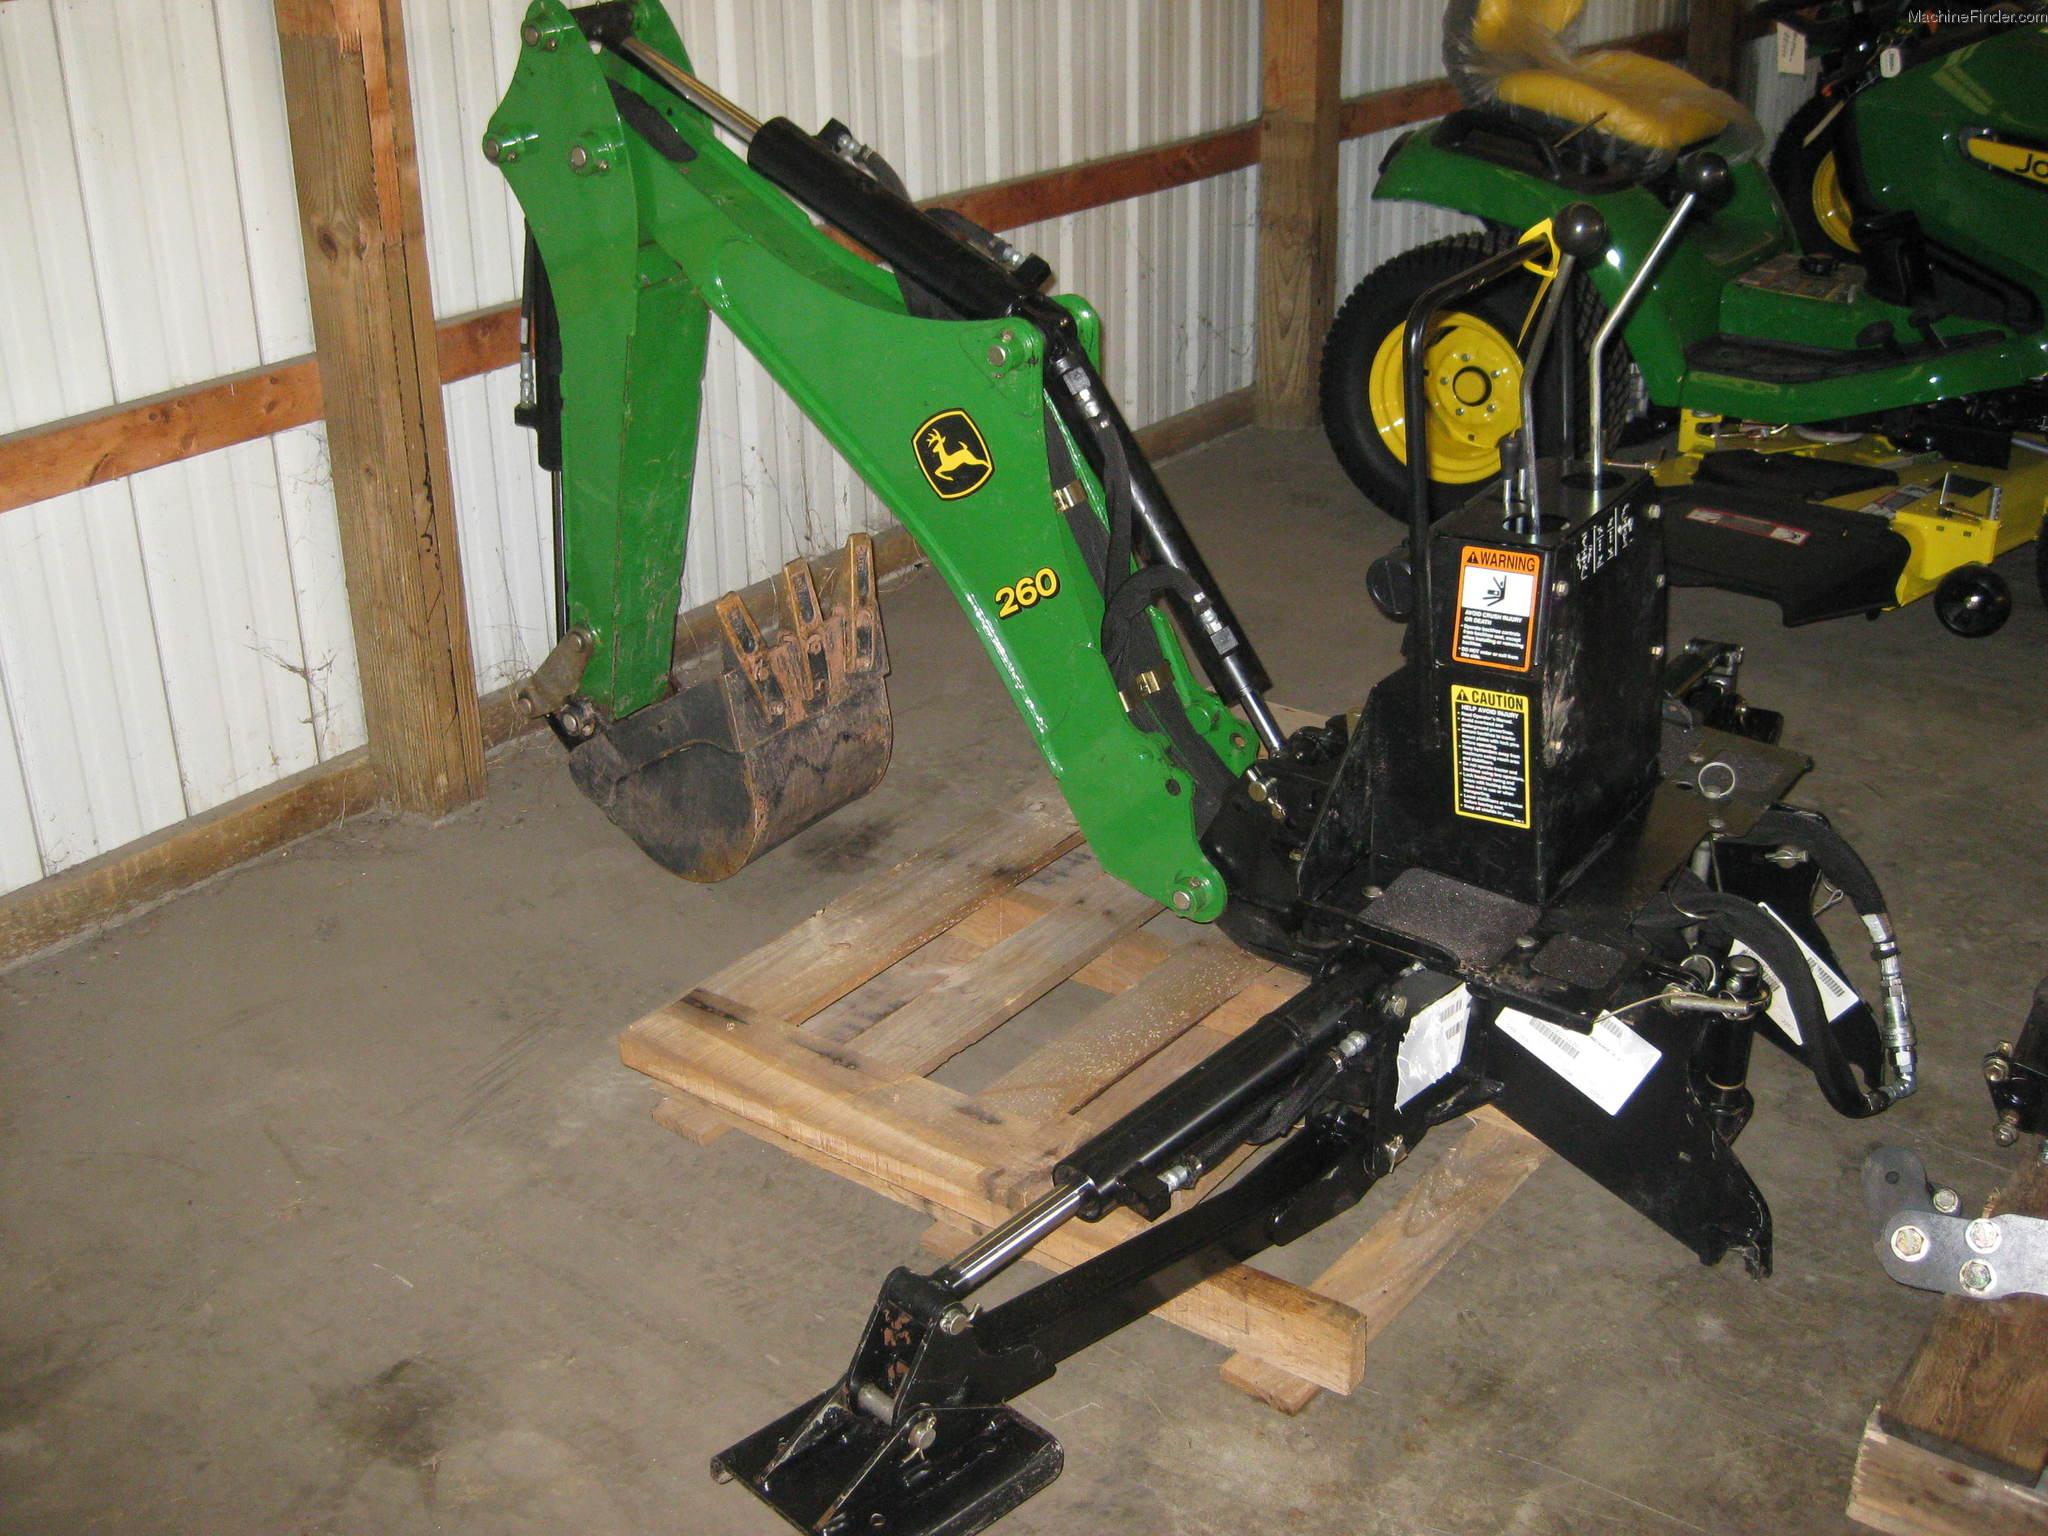 2008 John Deere 260 Attachments - John Deere MachineFinder